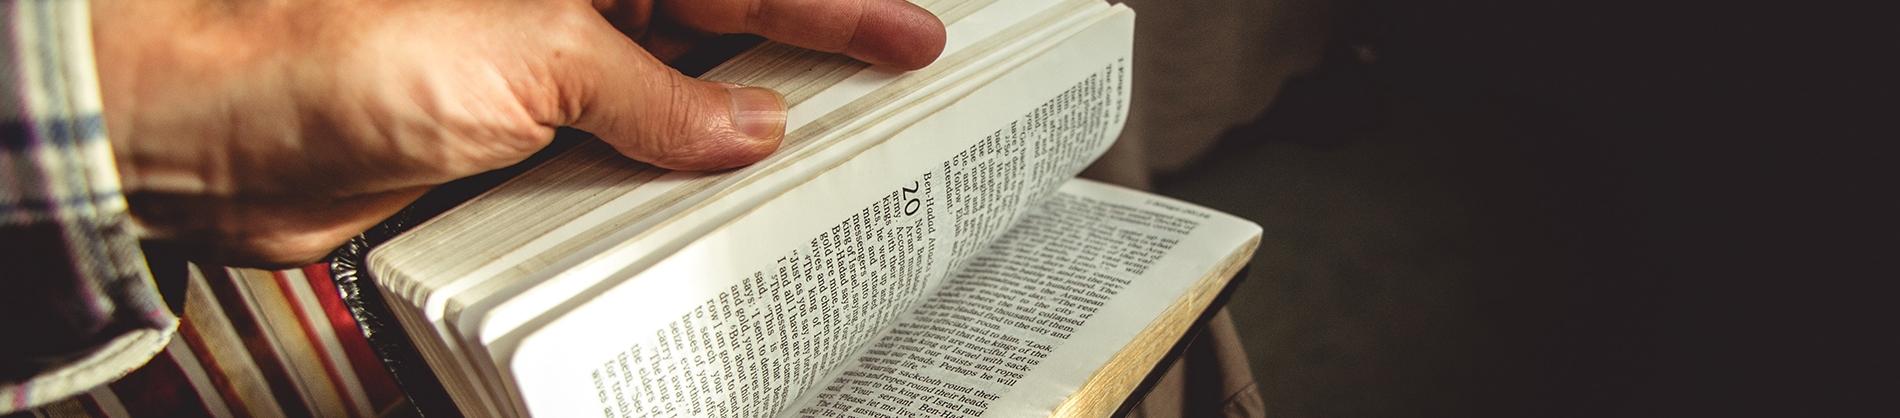 A man opening a bible